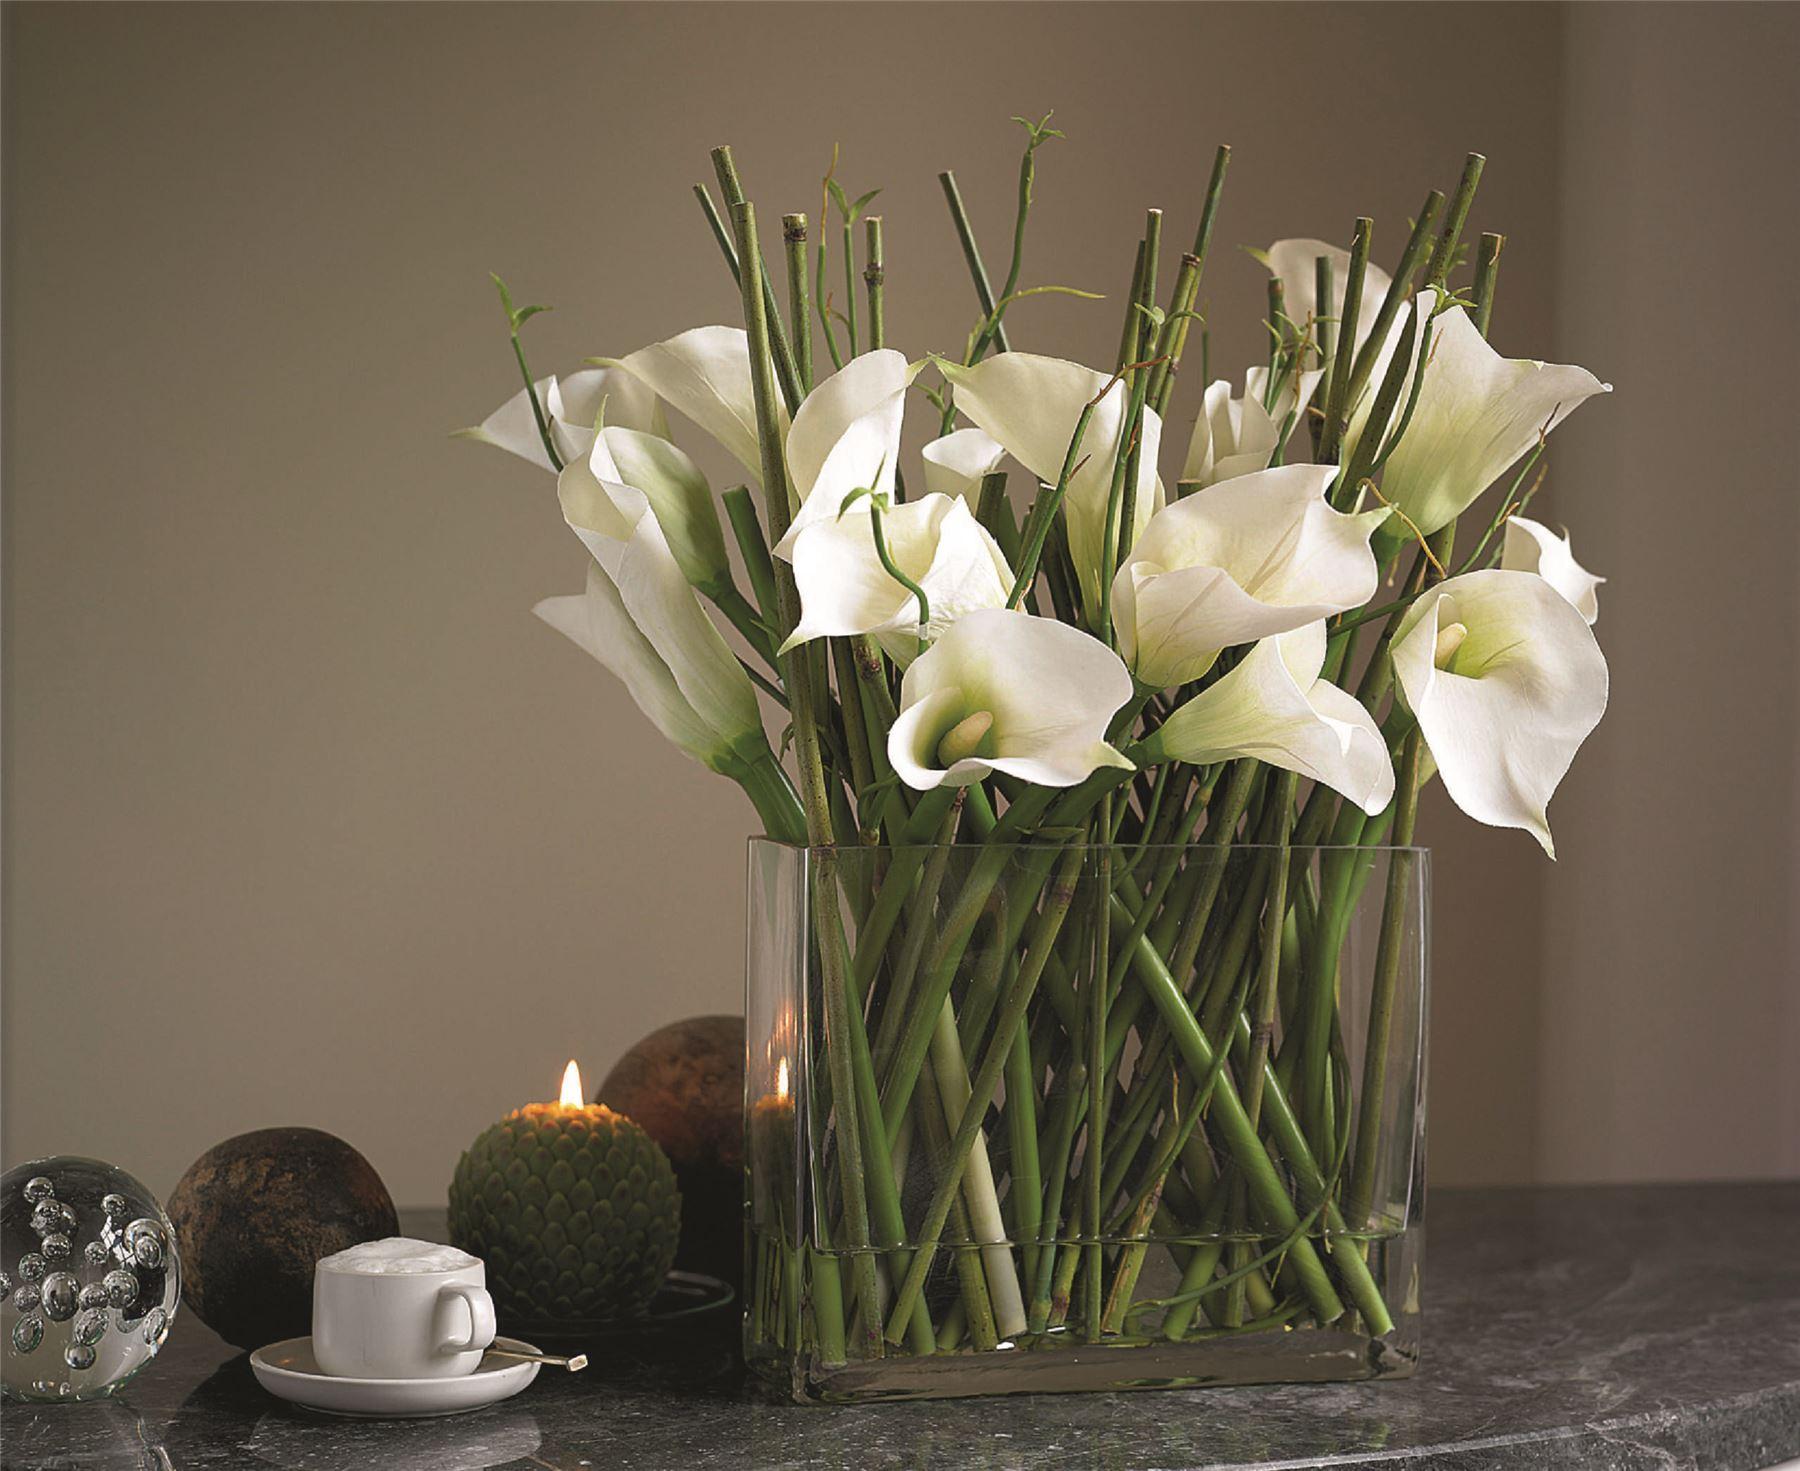 Bloom White Calla Lily Arrangement Slender Stems Green